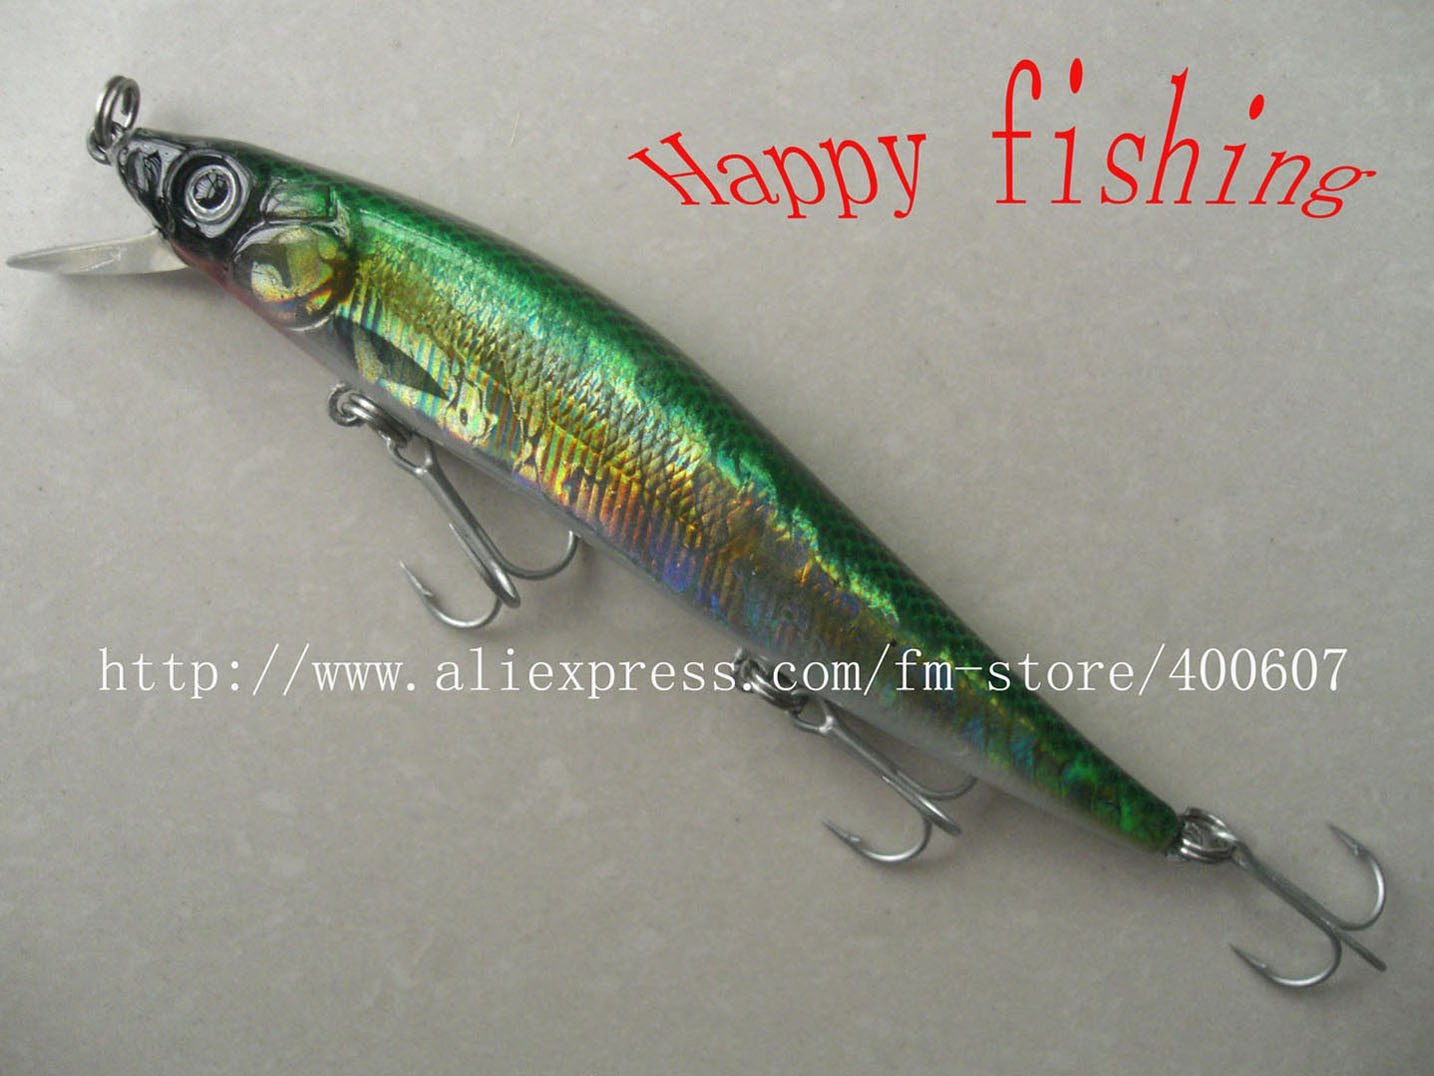 Bass Terminator  Minnow (M120S)Plastic  Fishing Lurejerk lure plastic hard bait fishing bait